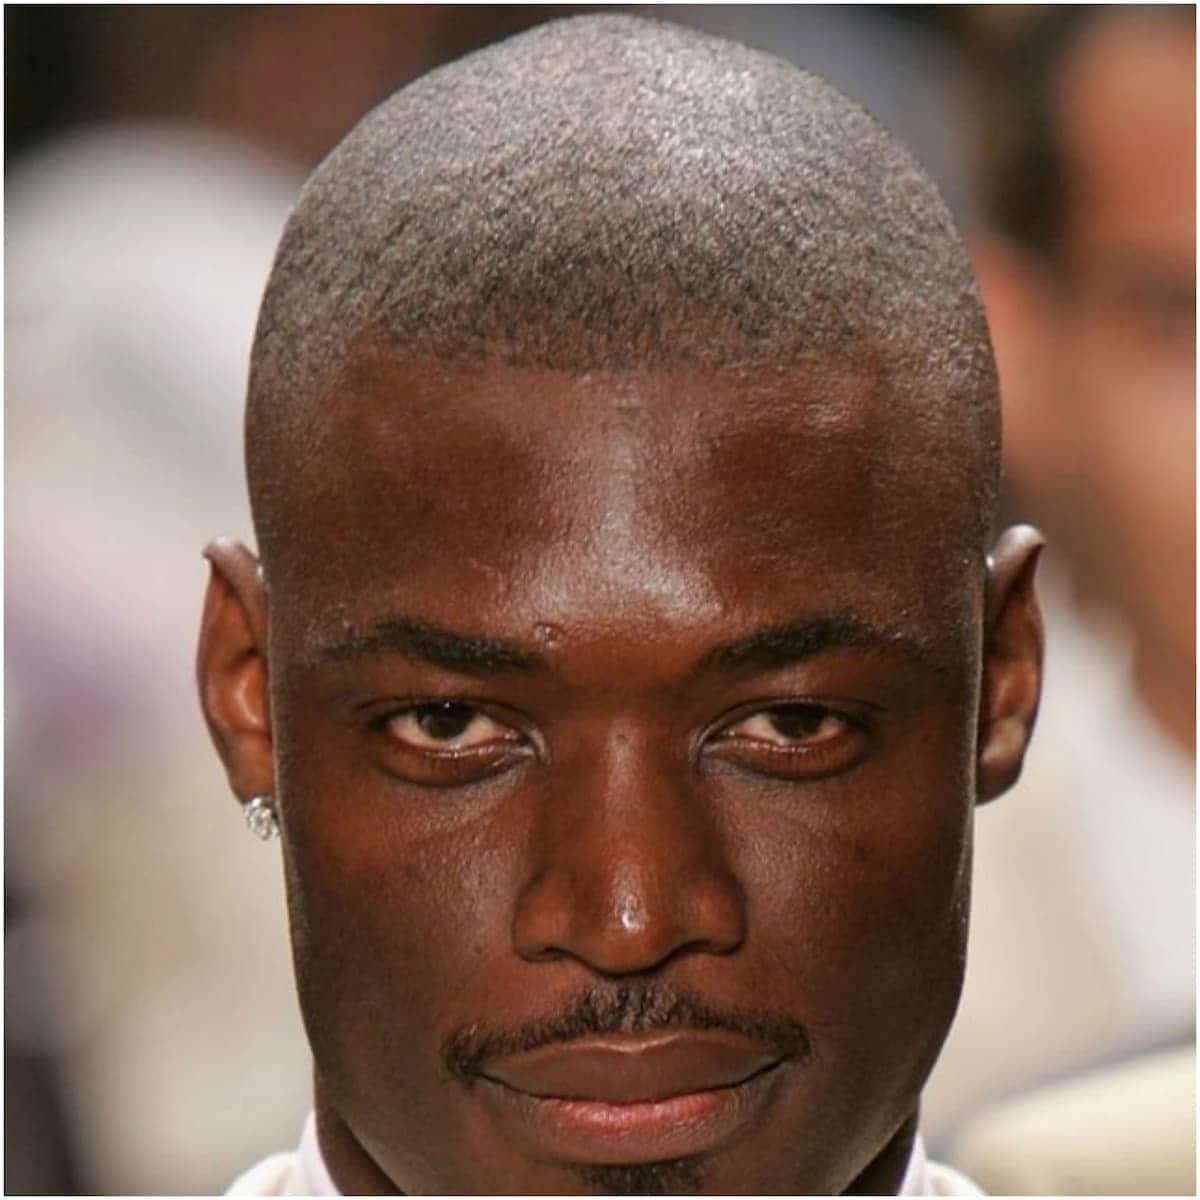 Buzz cut casual black men hairstyles